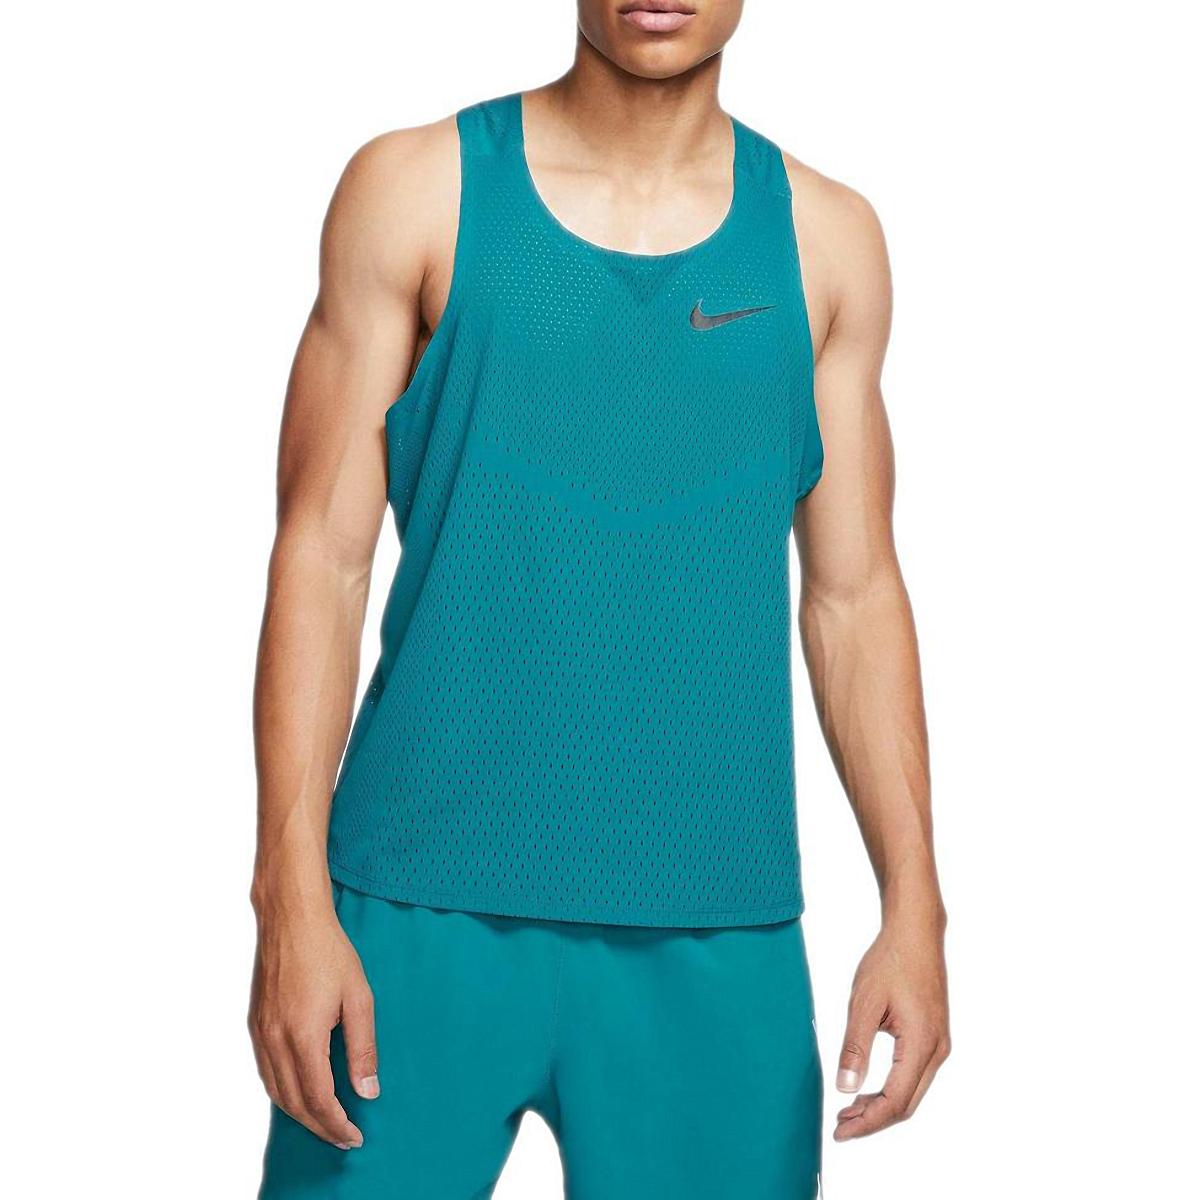 Men's Nike AeroSwift Singlet  - Color: Bright Spruce - Size: S, Bright Spruce, large, image 1